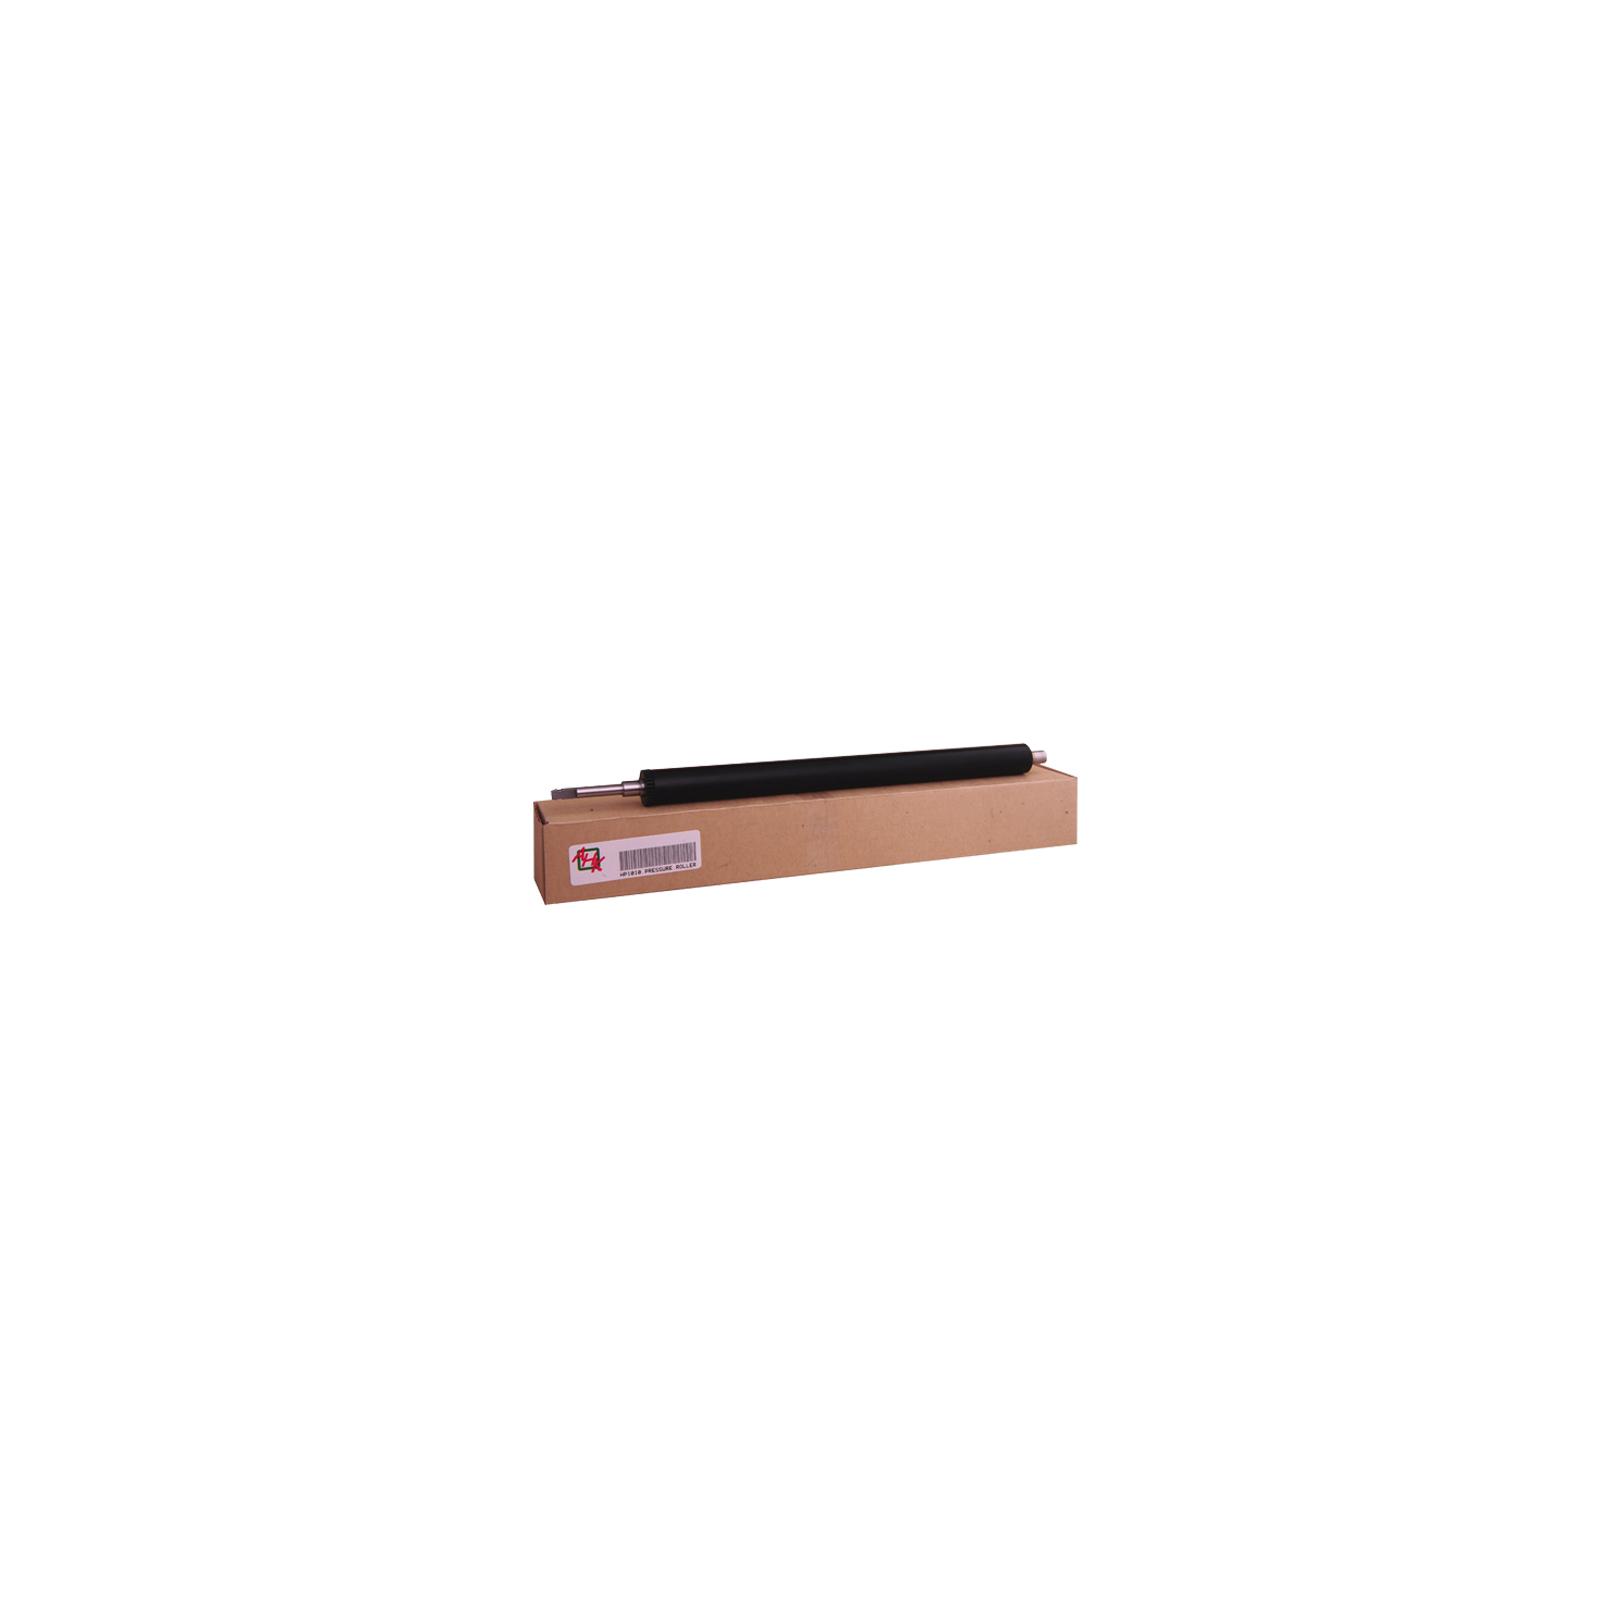 Вал резиновый HP LJ 1010/1012/1015/1020 AHK (2100240)